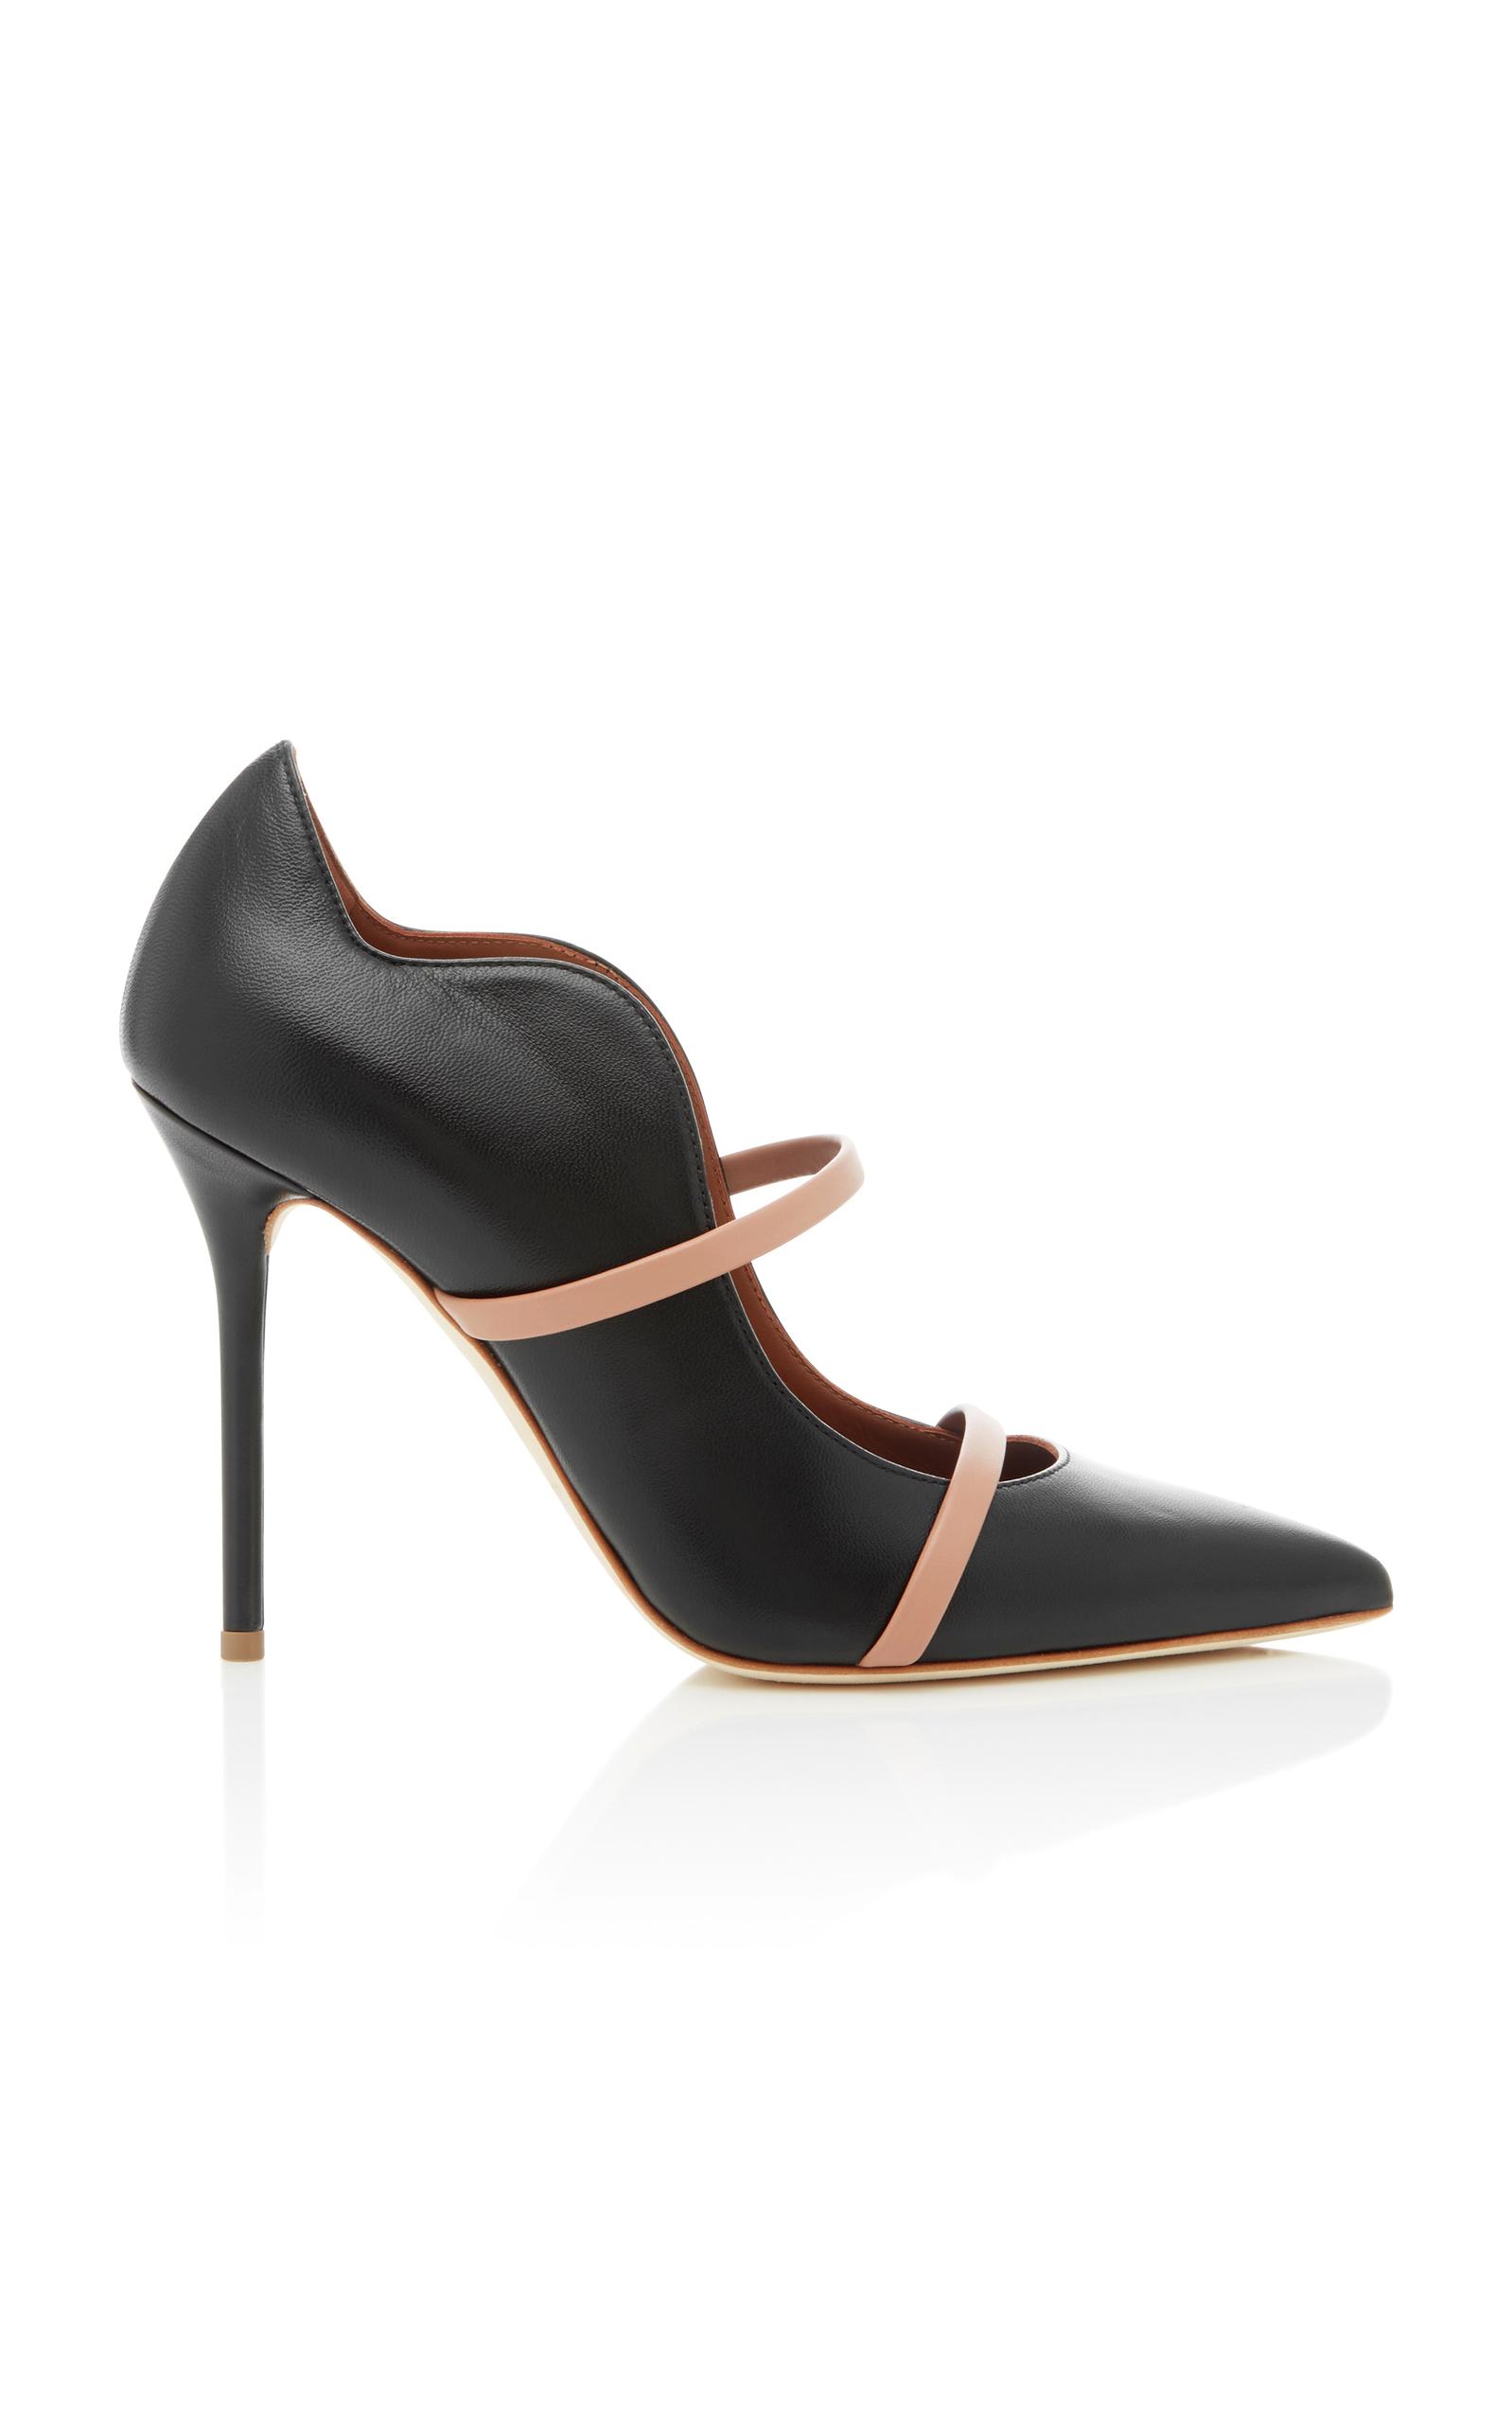 Black Satin And Mirror Platinum Nappa Leather Maureen High Heel Pumps